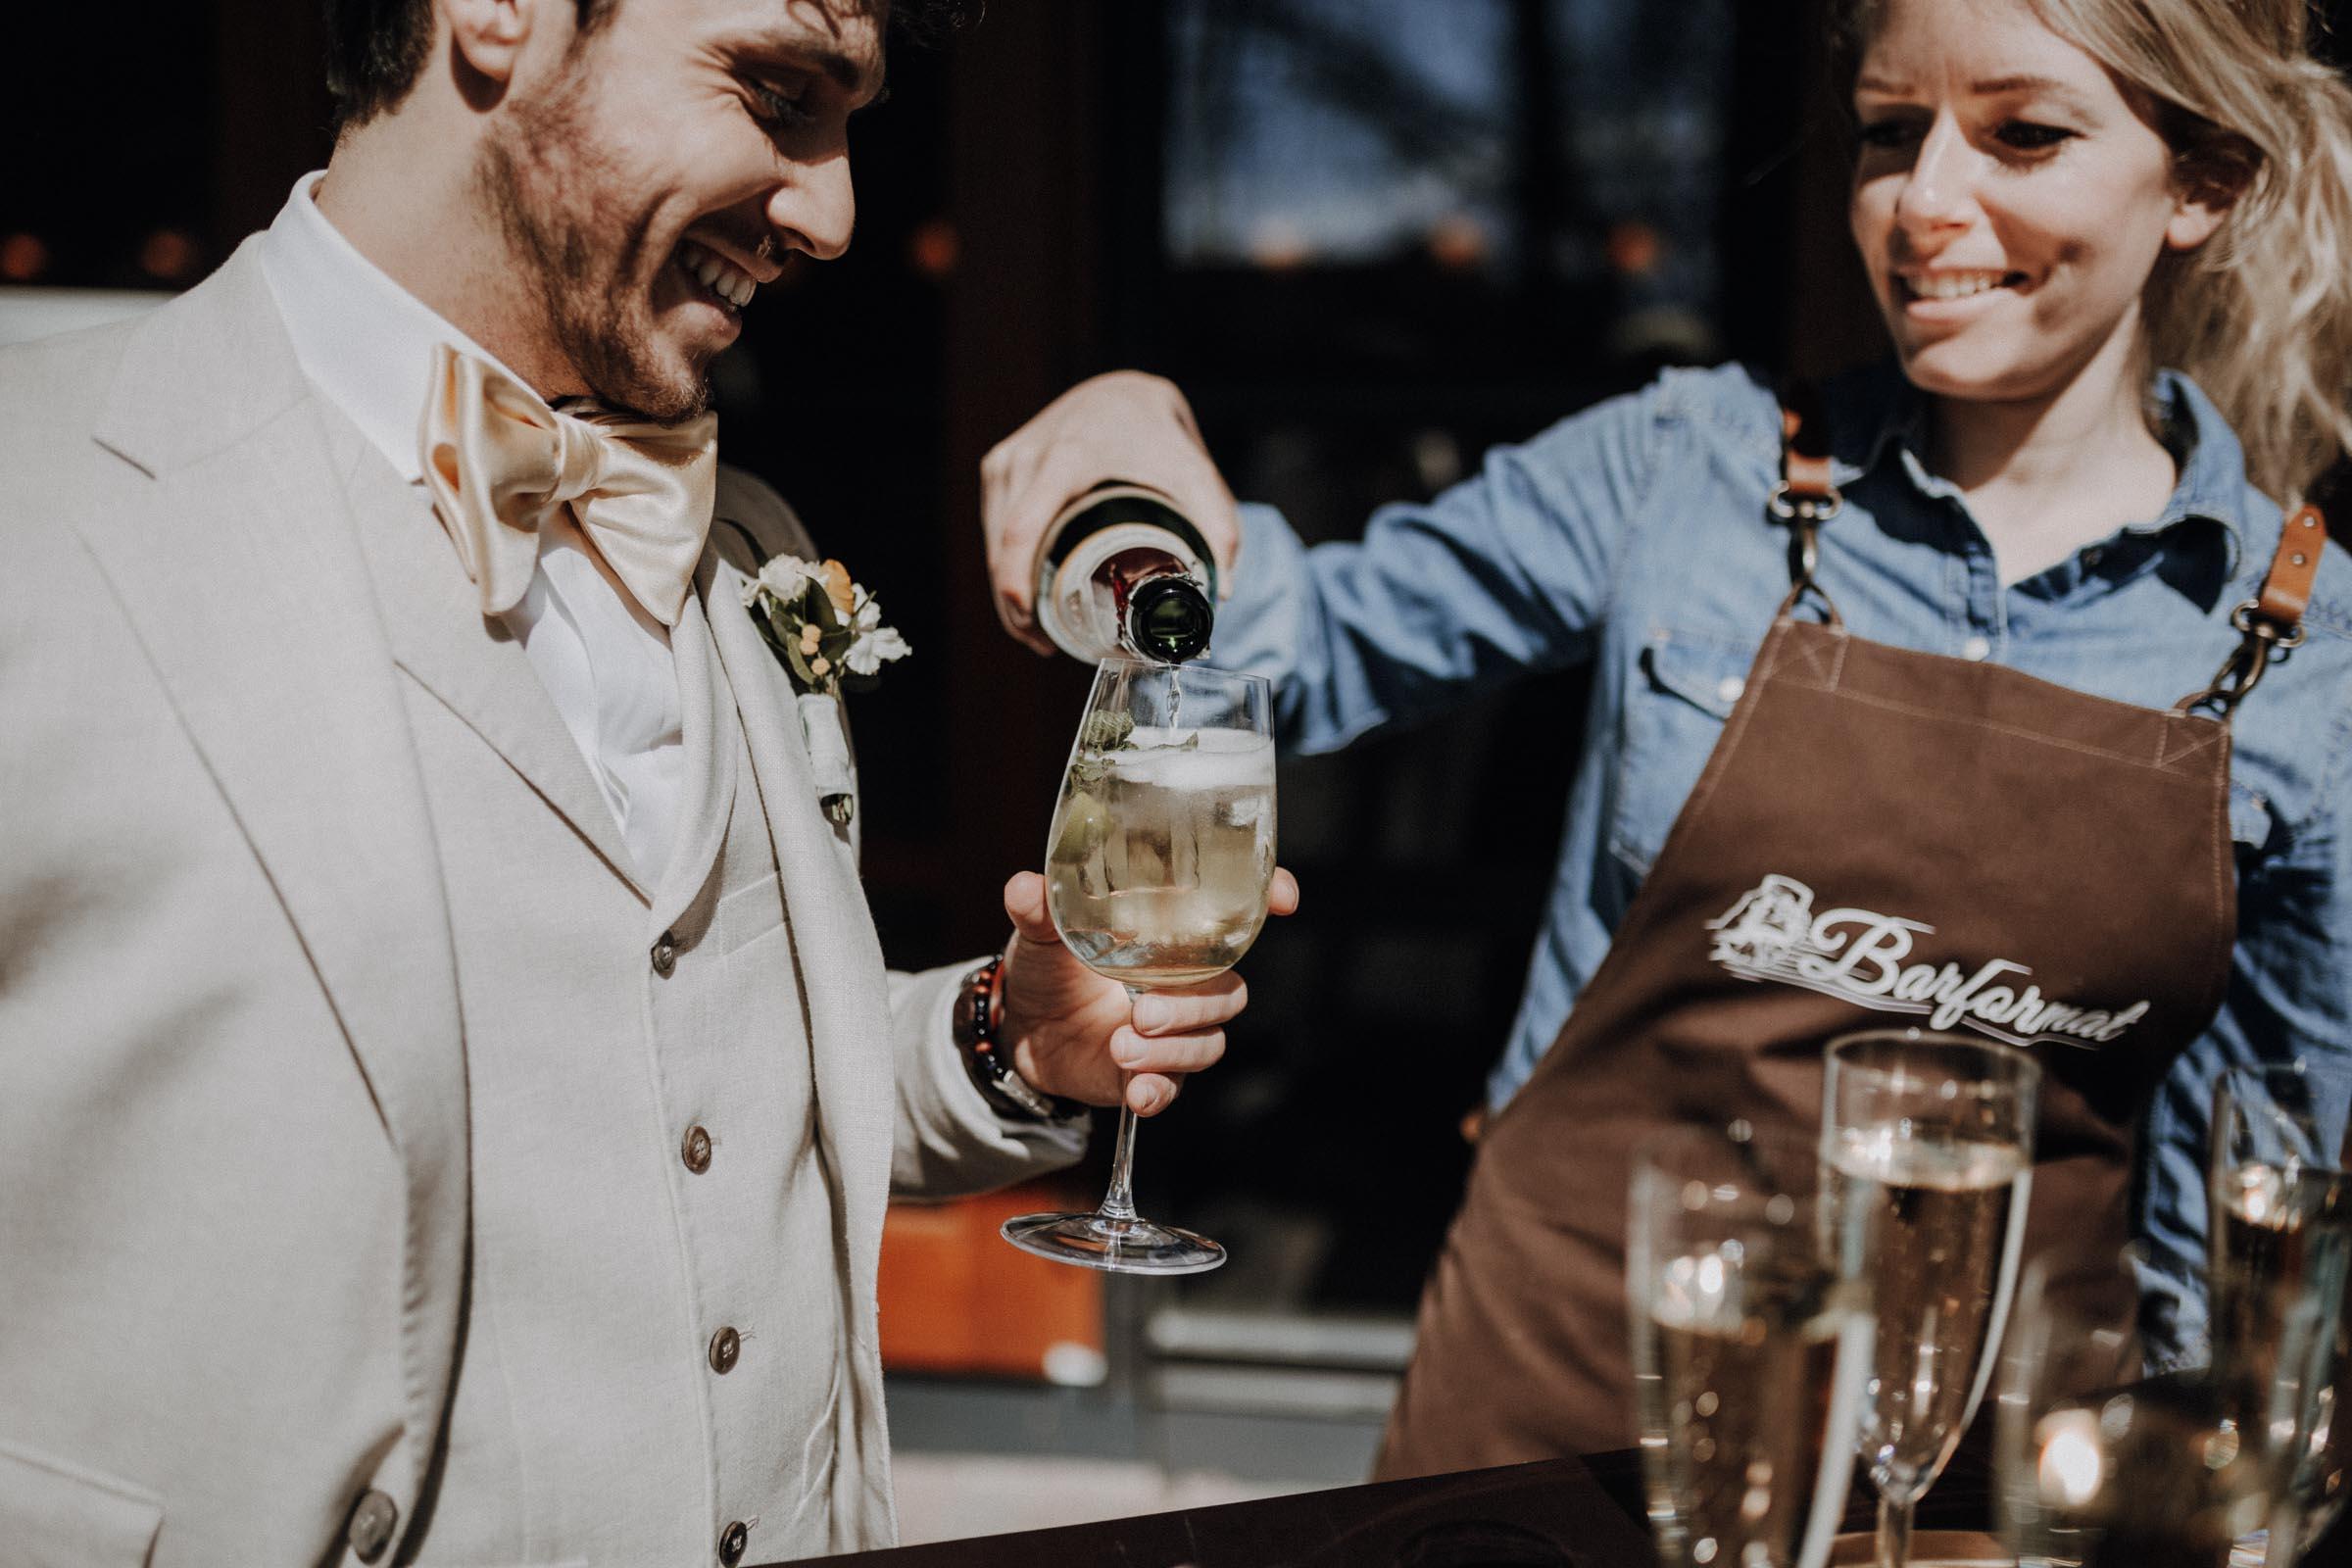 Mobile | Bar | Ape | Bulli | Cocktailservice | Cocktail | Bus | Catering | Hannover | Getränke | Foodtruck | Sektempfang | Standesamt | Hochzeit | Barkeeper | Hochzeit | Mieten | Event | Buchen | Barformat